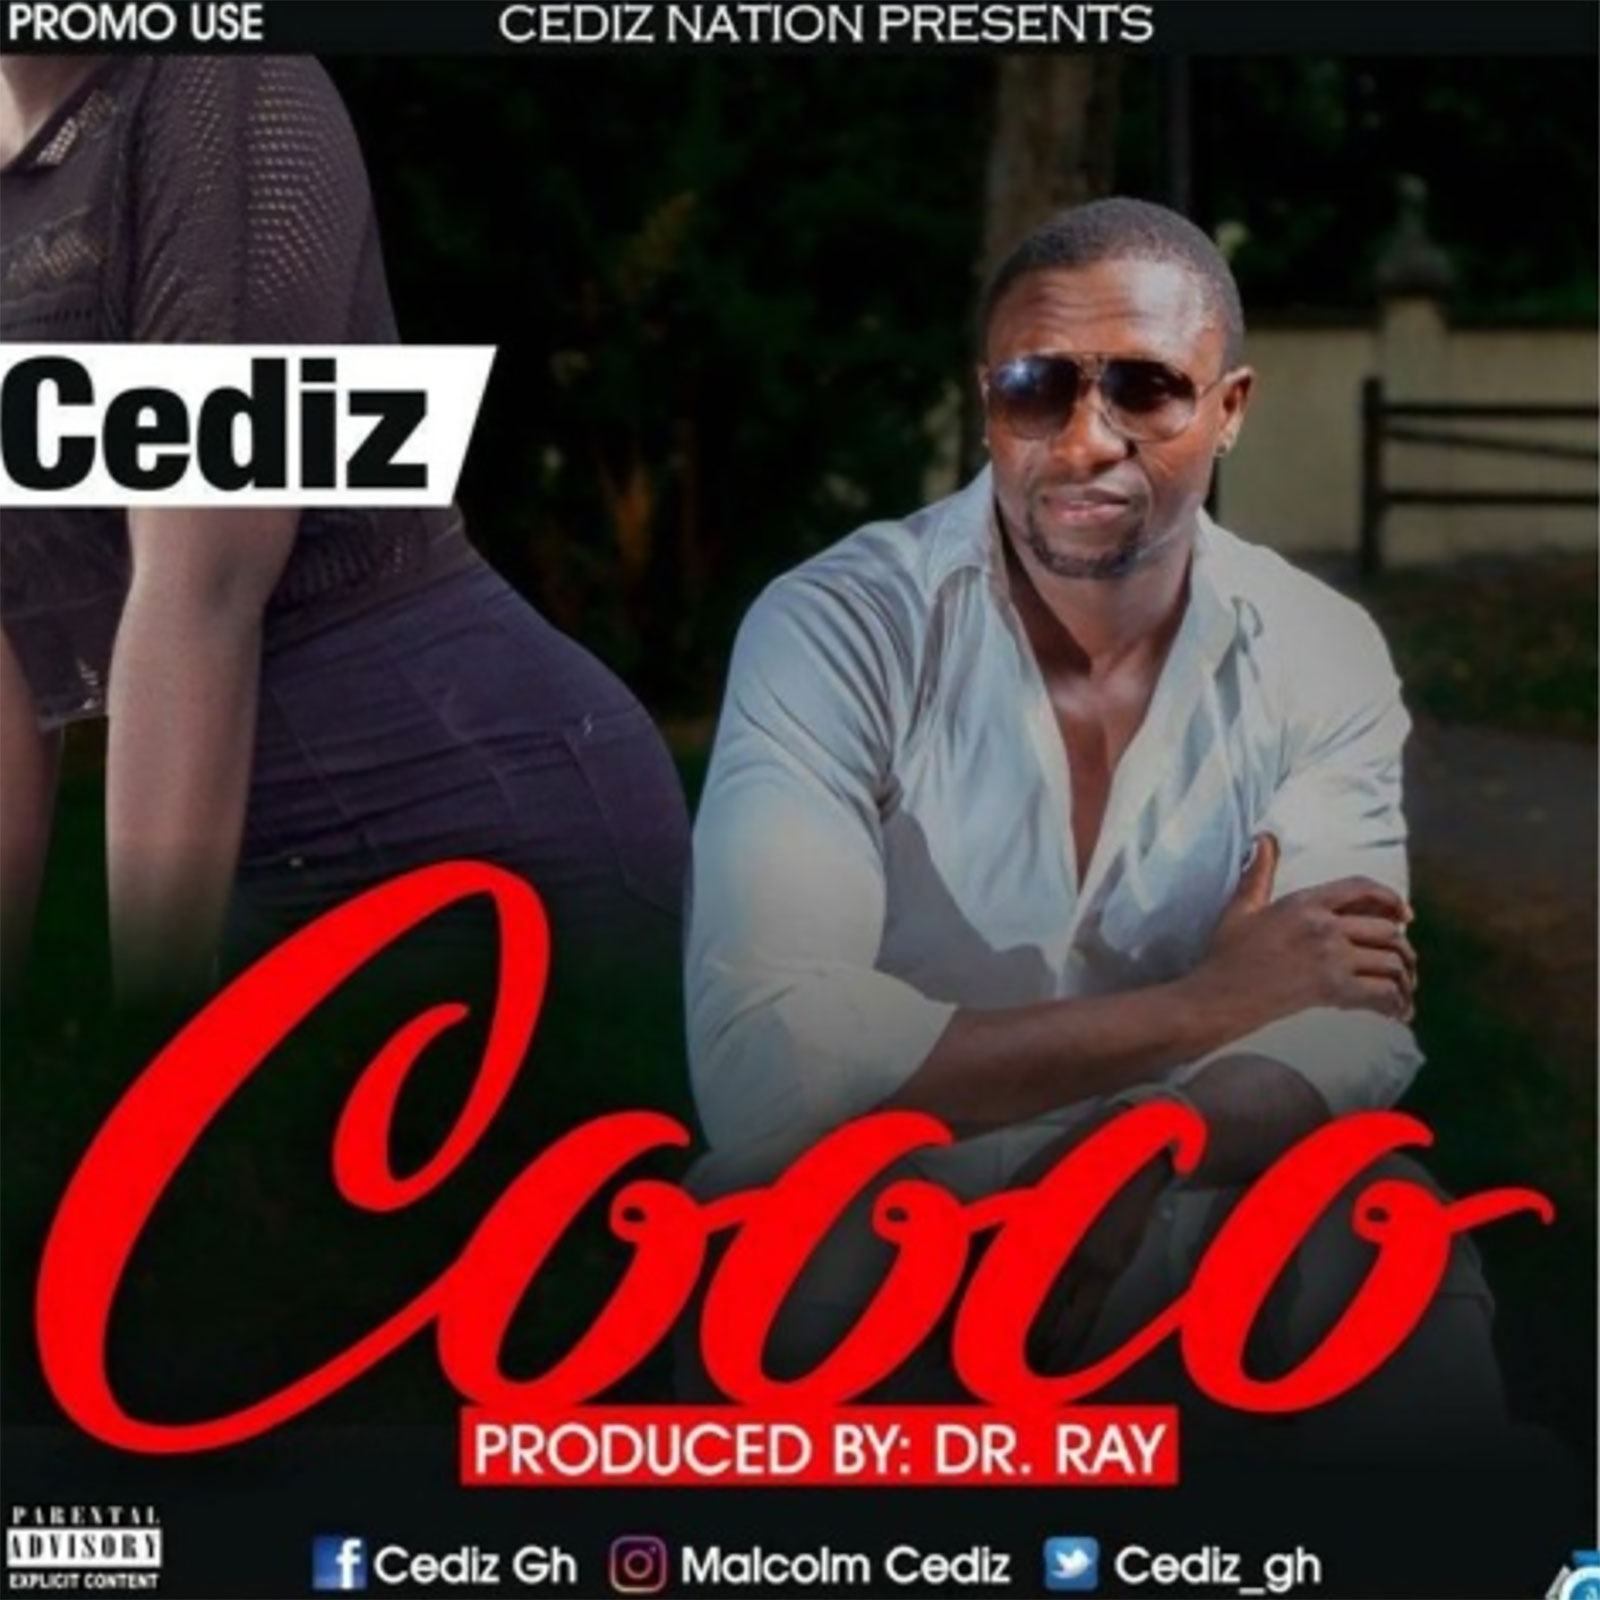 Cooco by Cediz